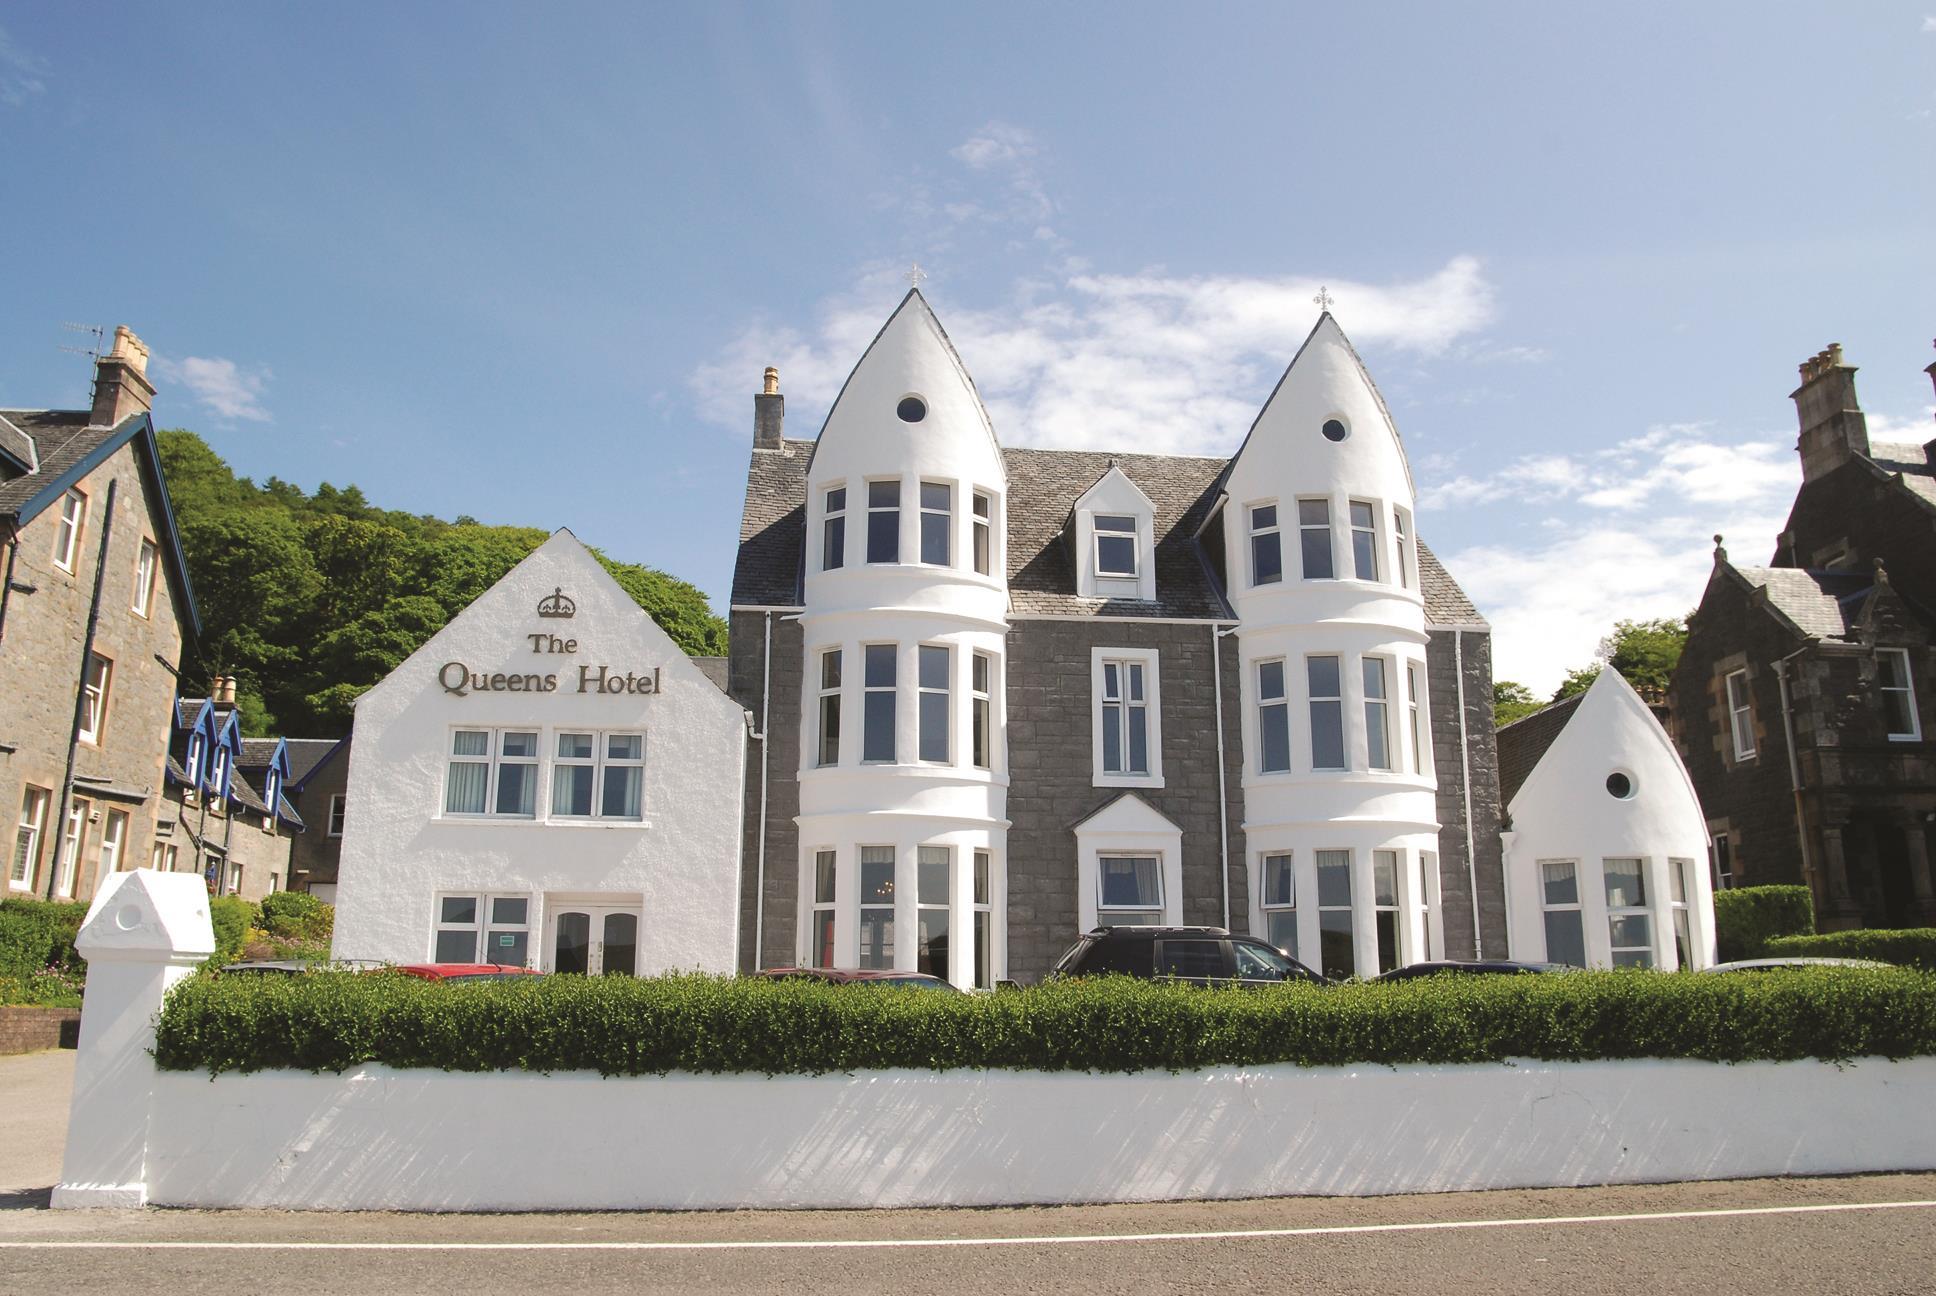 Best Western The Queens Hotel Hotels In Oban Lochaline Pa34 5ag